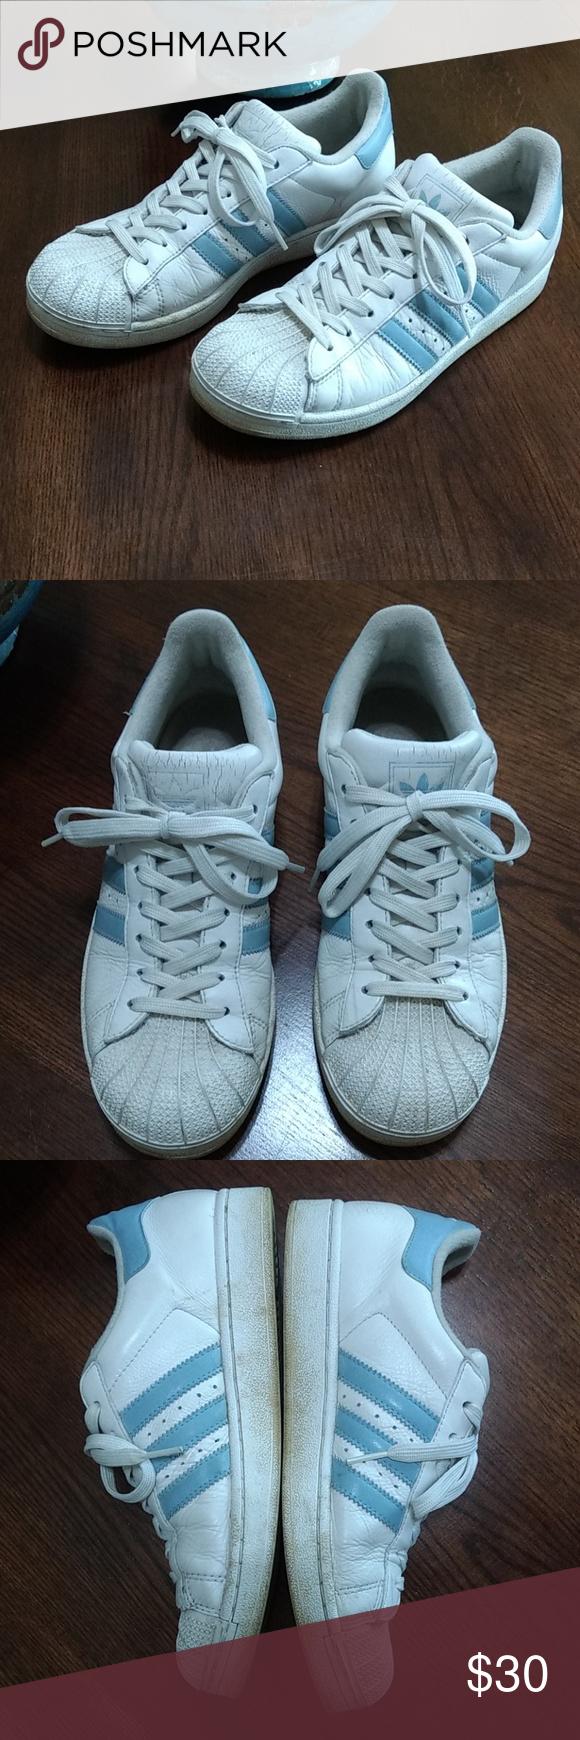 Adidas shoes   Adidas shoes women